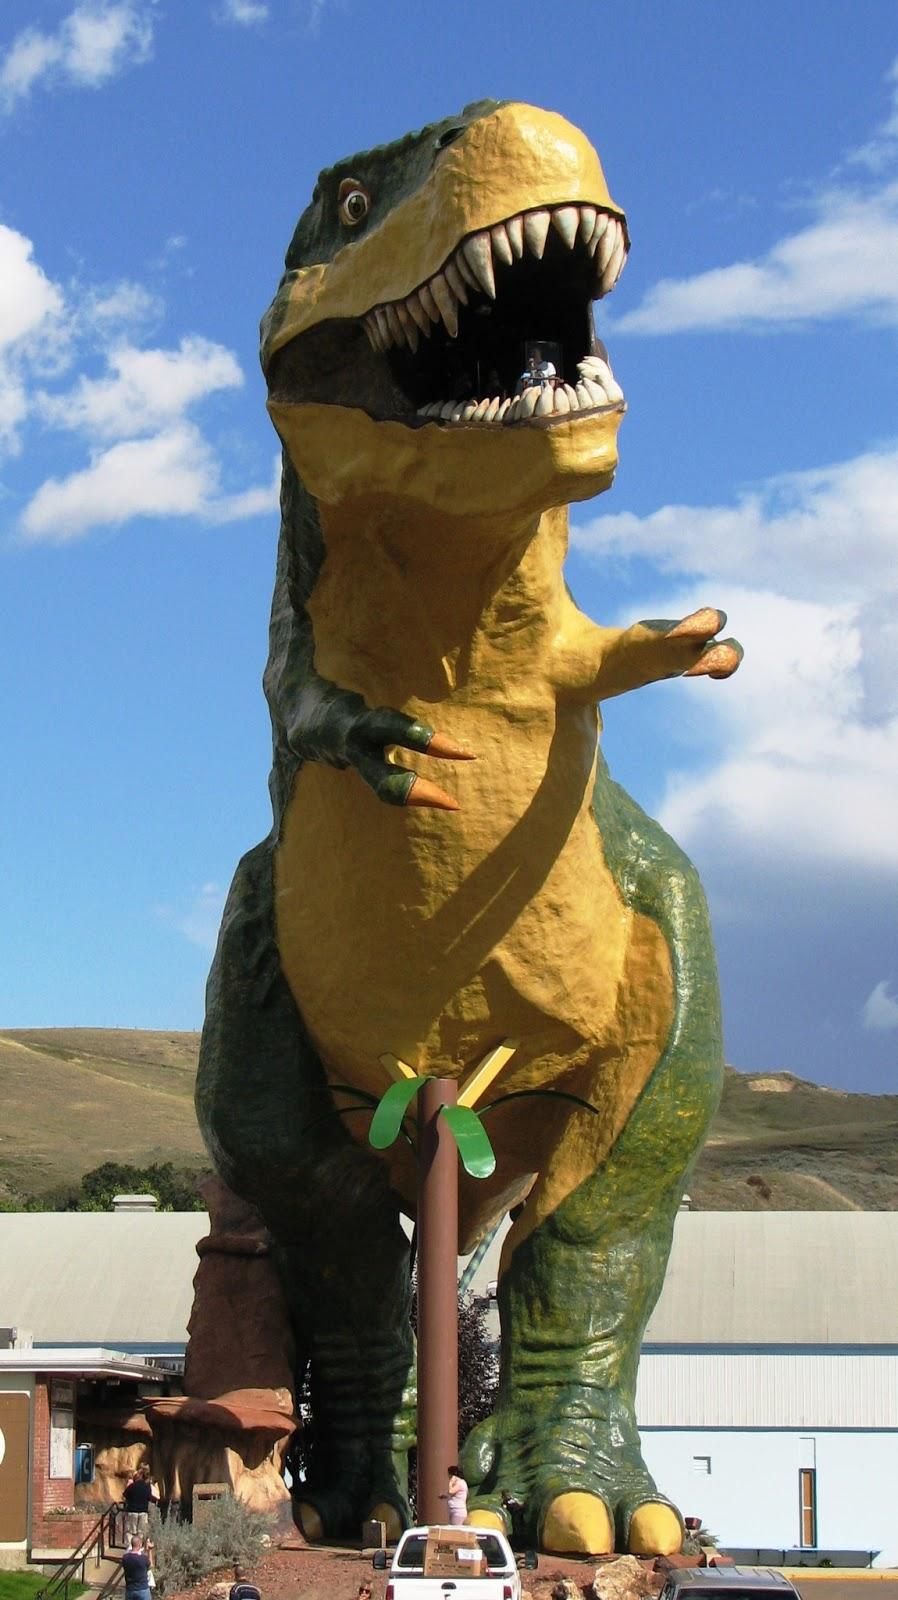 003 - World's Largest Dinosaur